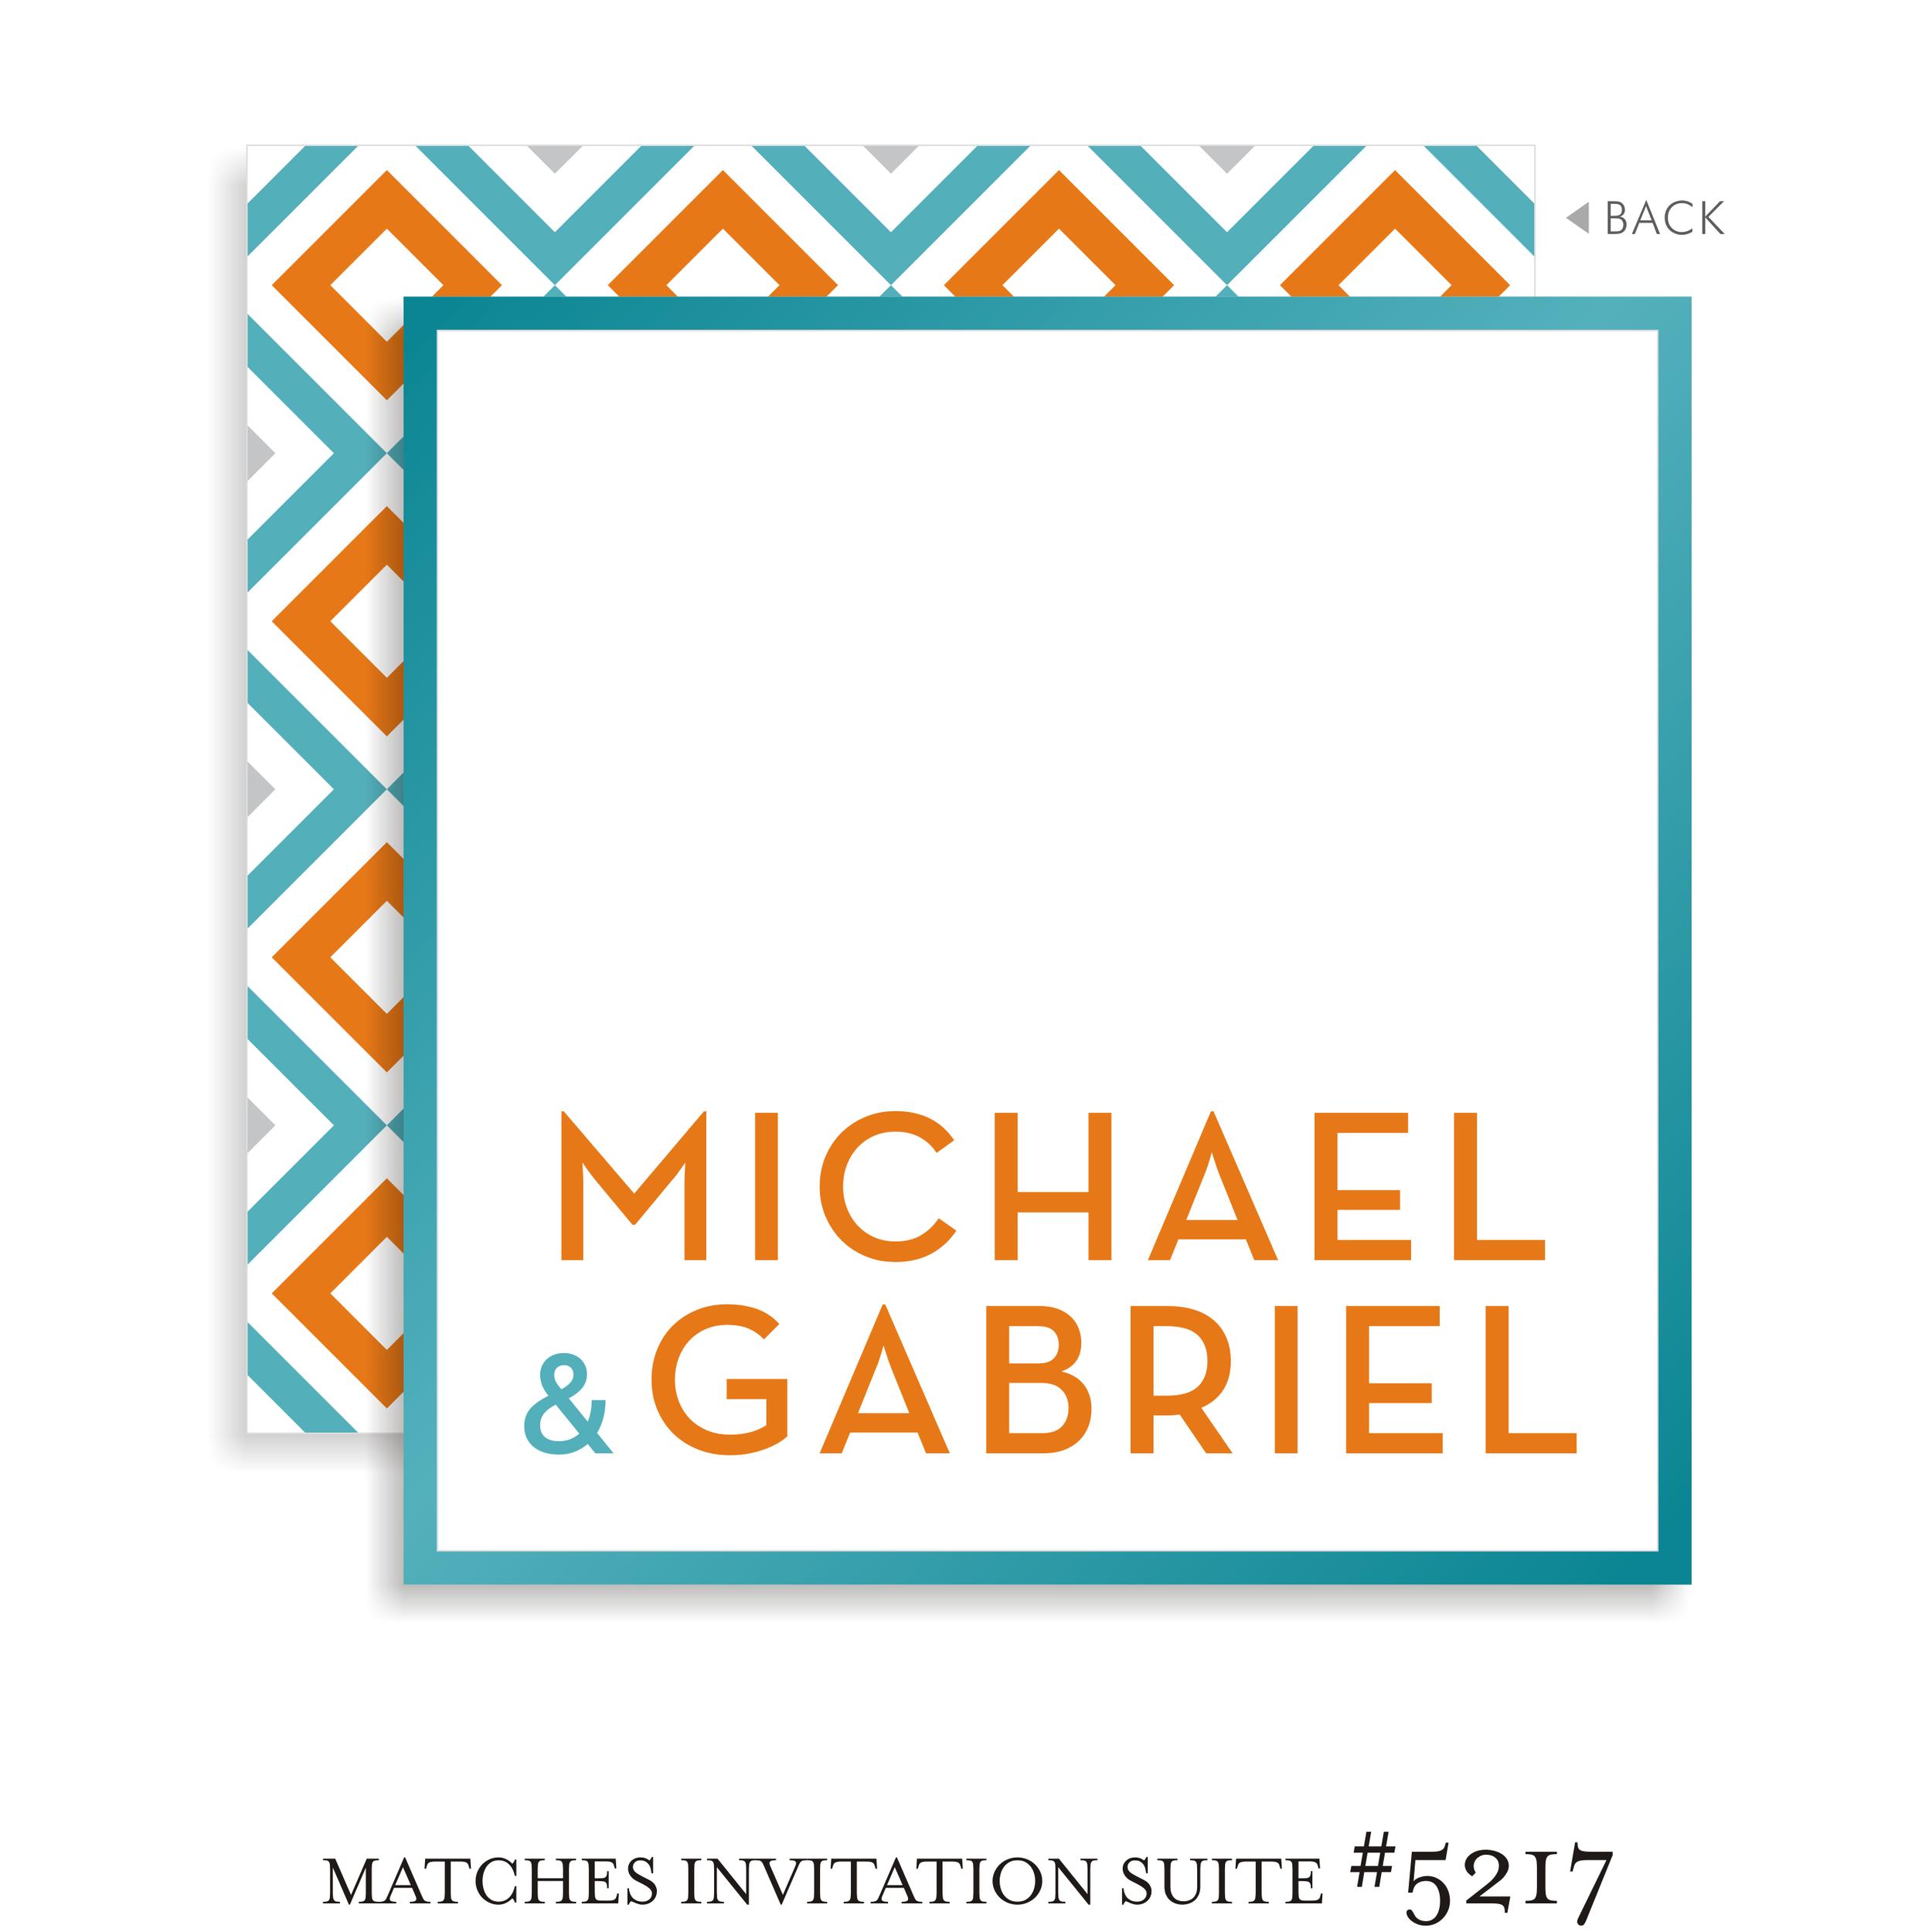 Bar Mitzvah Sign In Board 5217 - Michael Gabriel